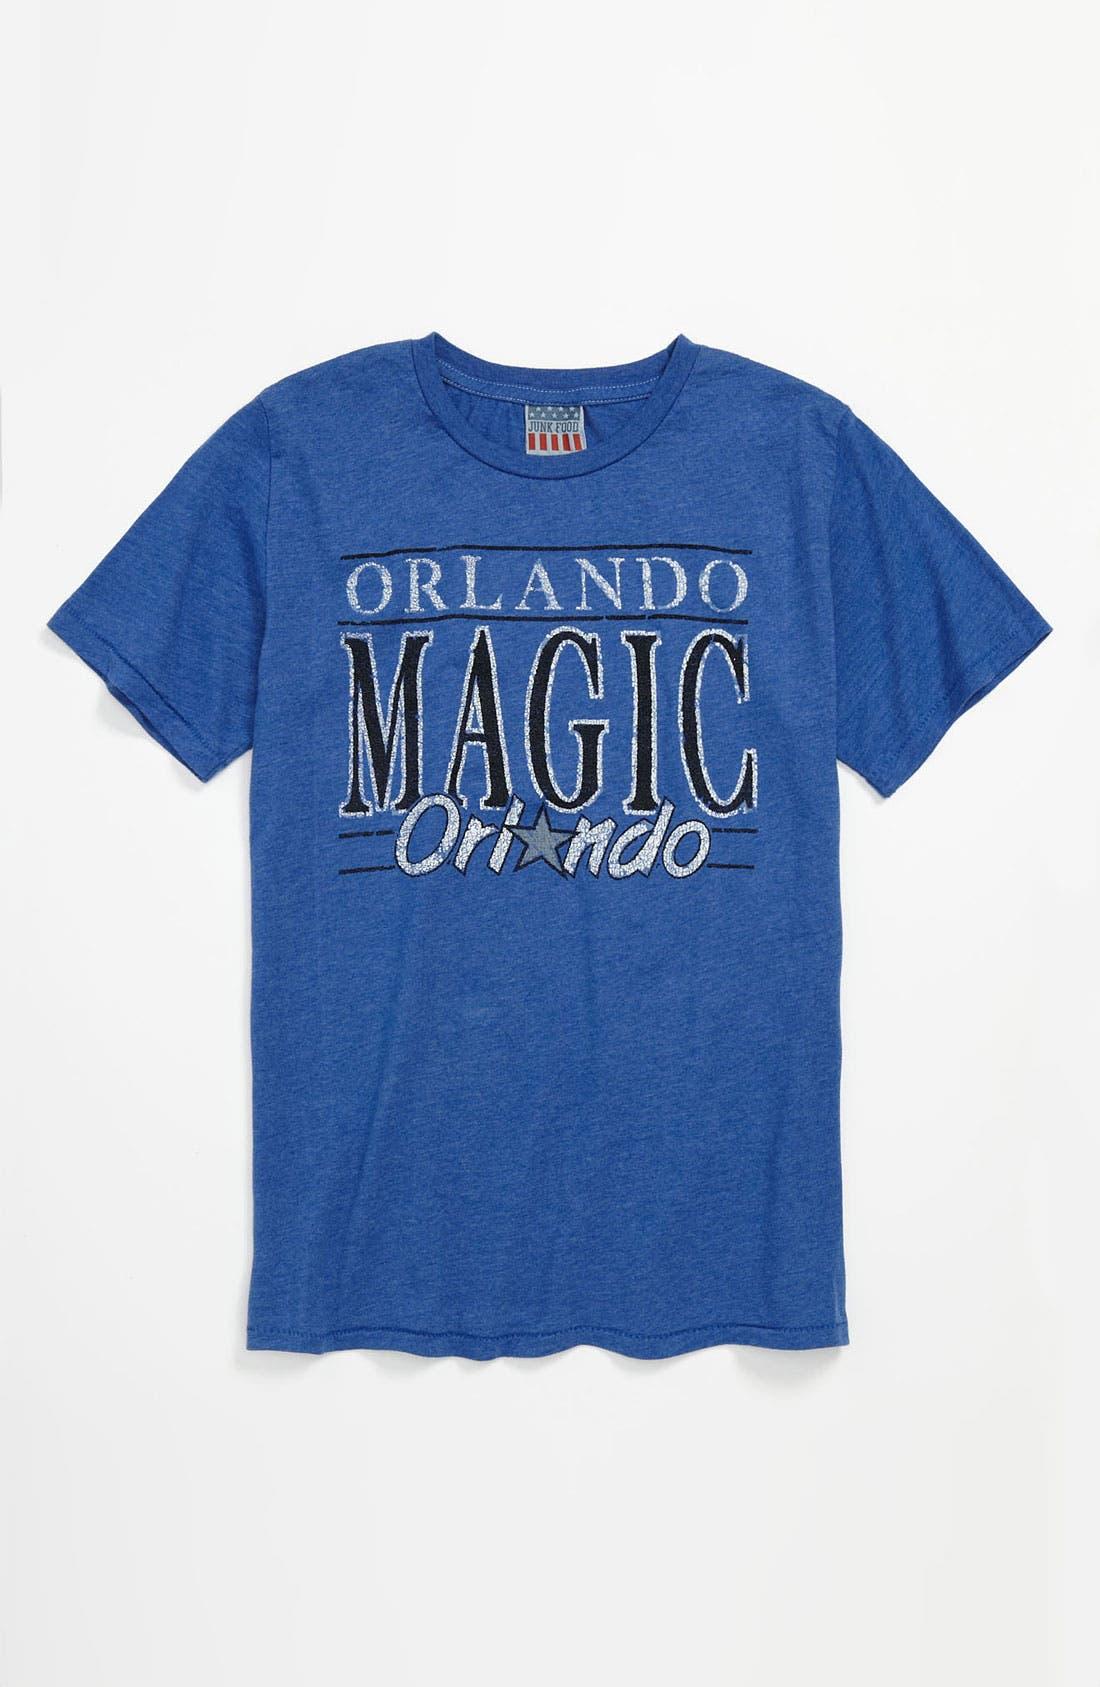 Alternate Image 1 Selected - Junk Food 'Orlando Magic' T-Shirt (Little Boys & Big Boys)